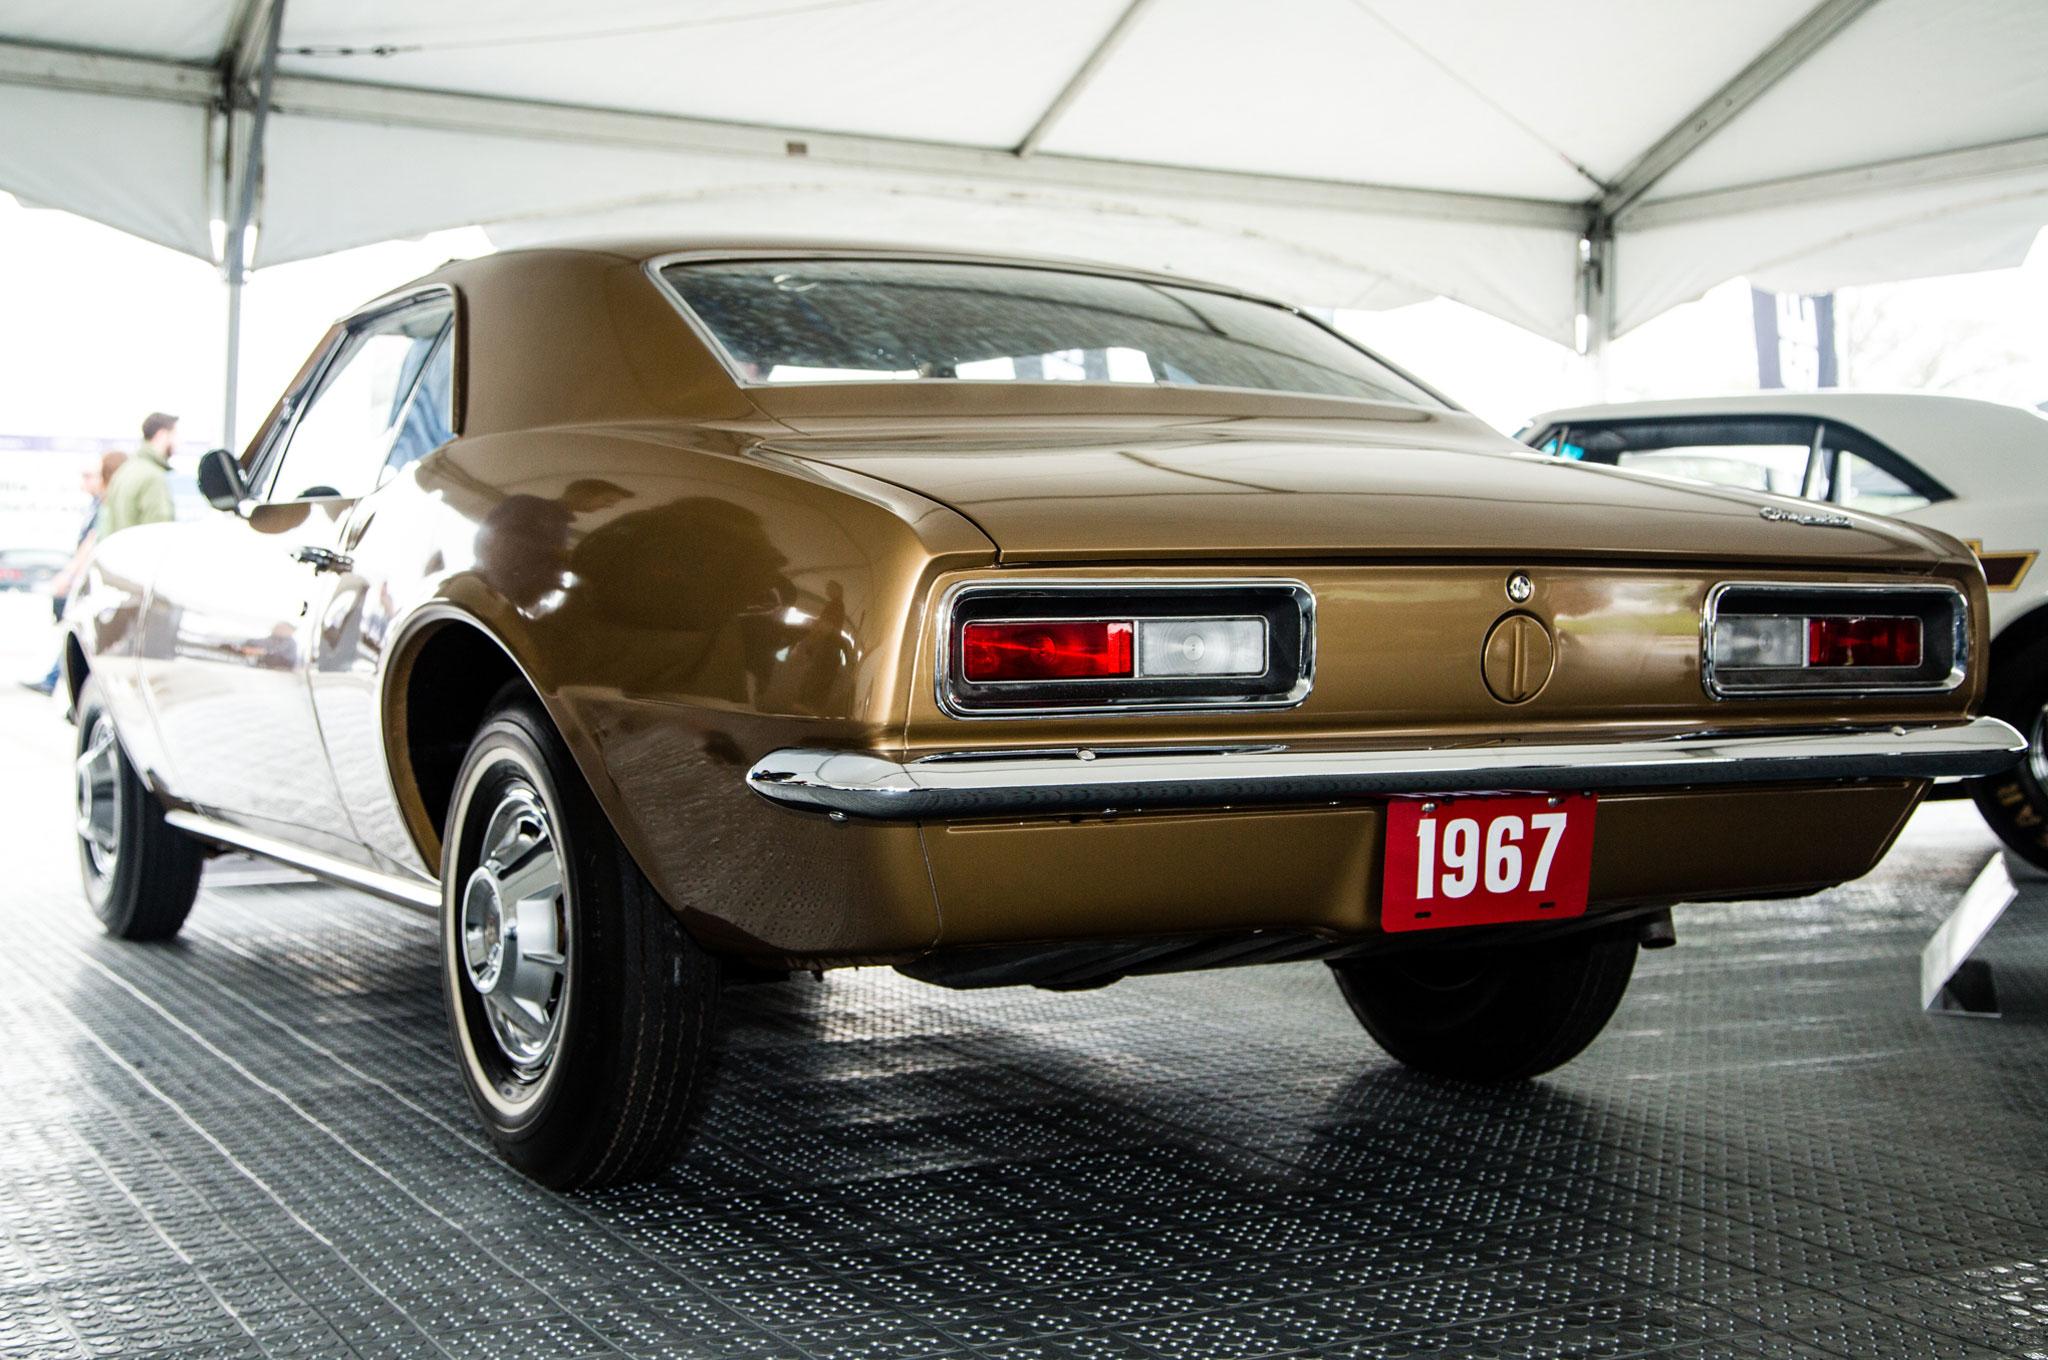 1967 Chevrolet Camaro VIN 1000001 2